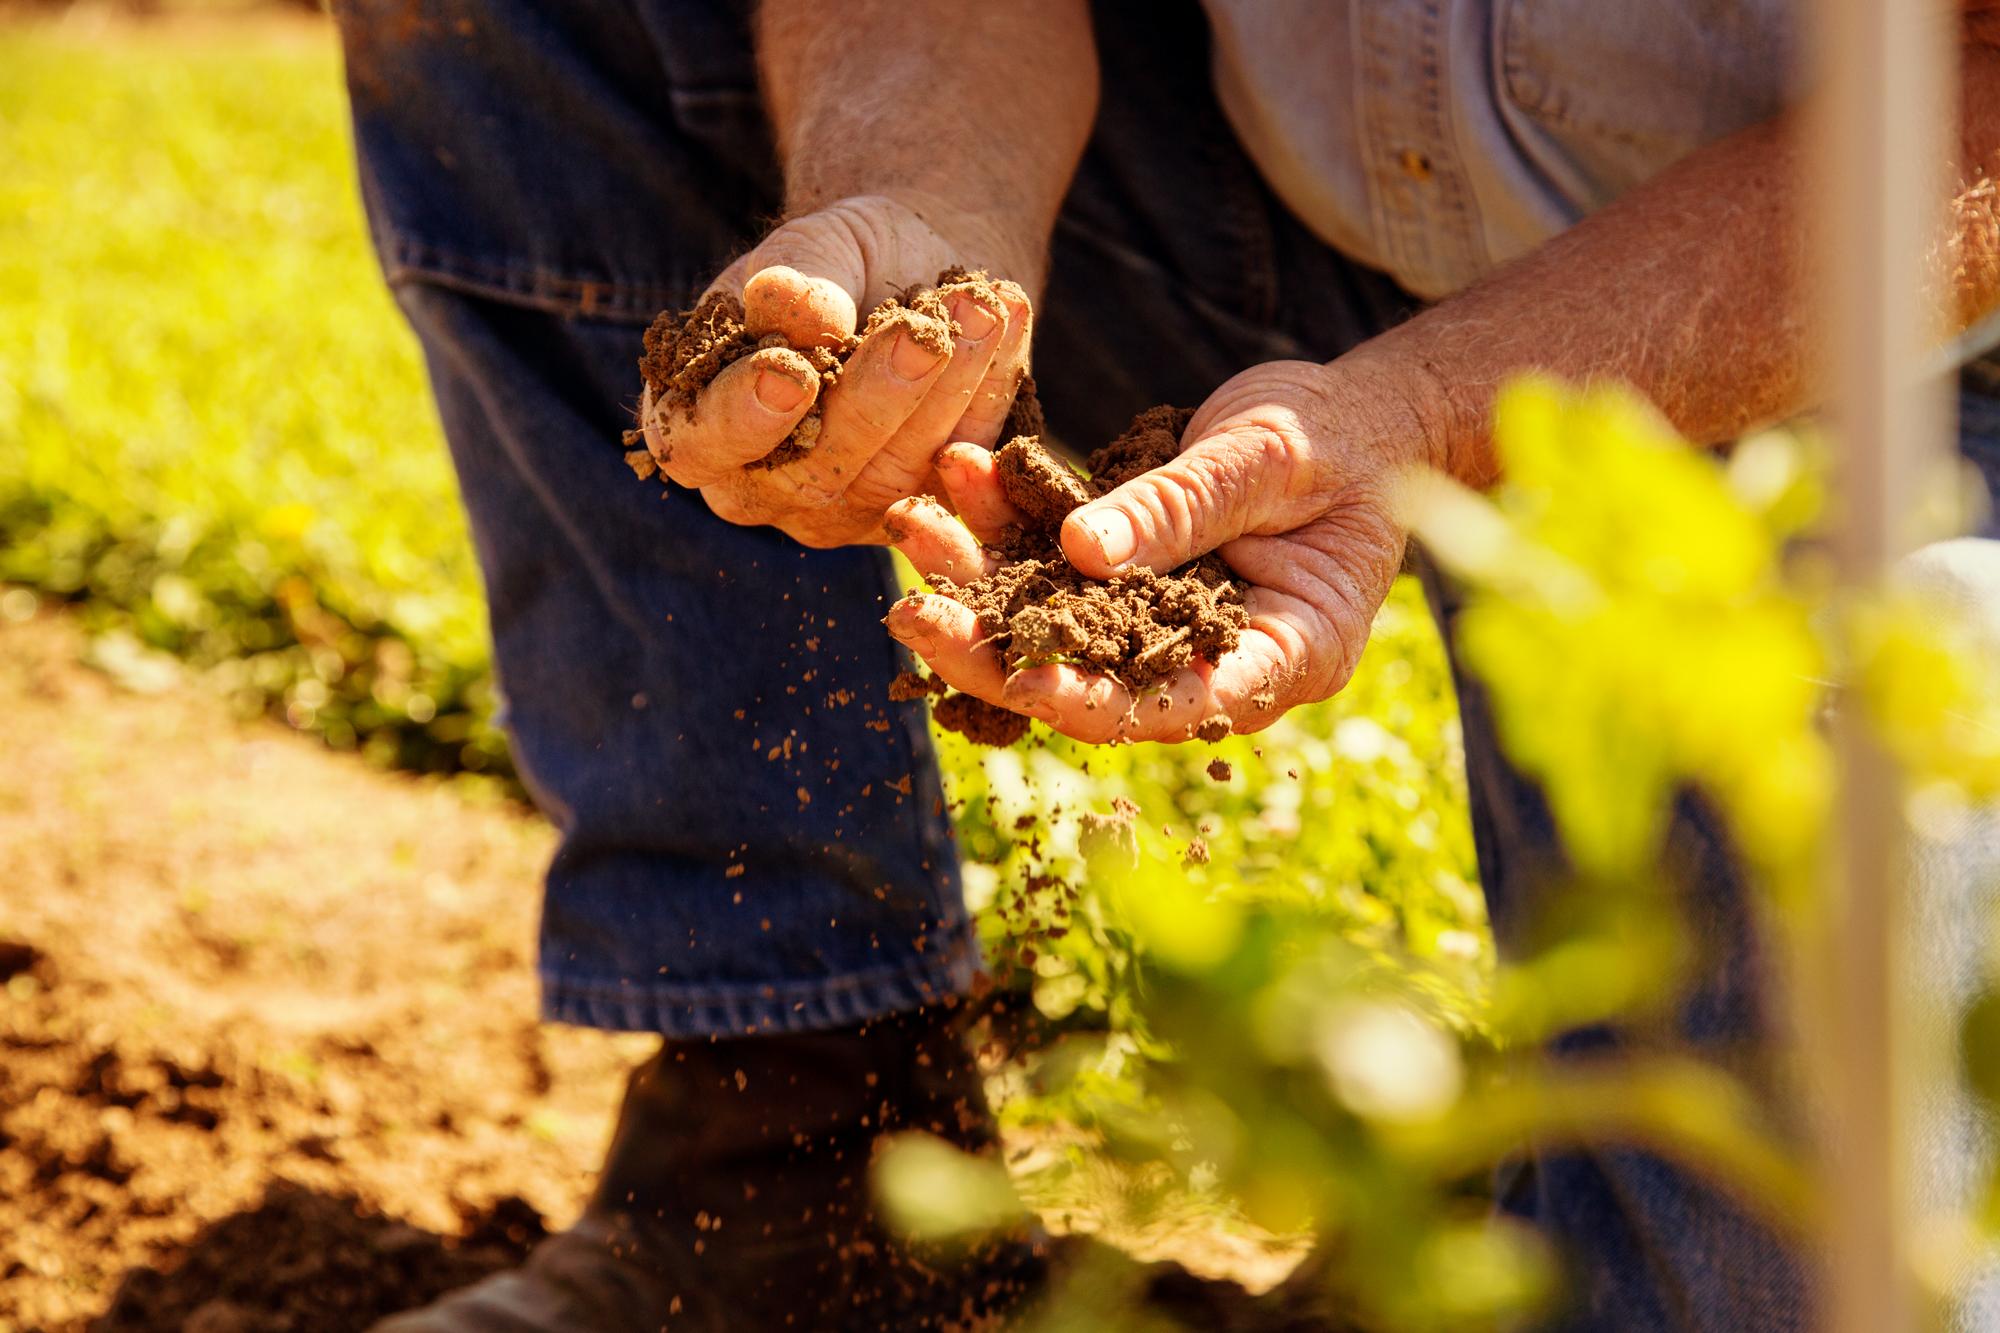 Missouri Agritourism - Missouri Farm Bureau